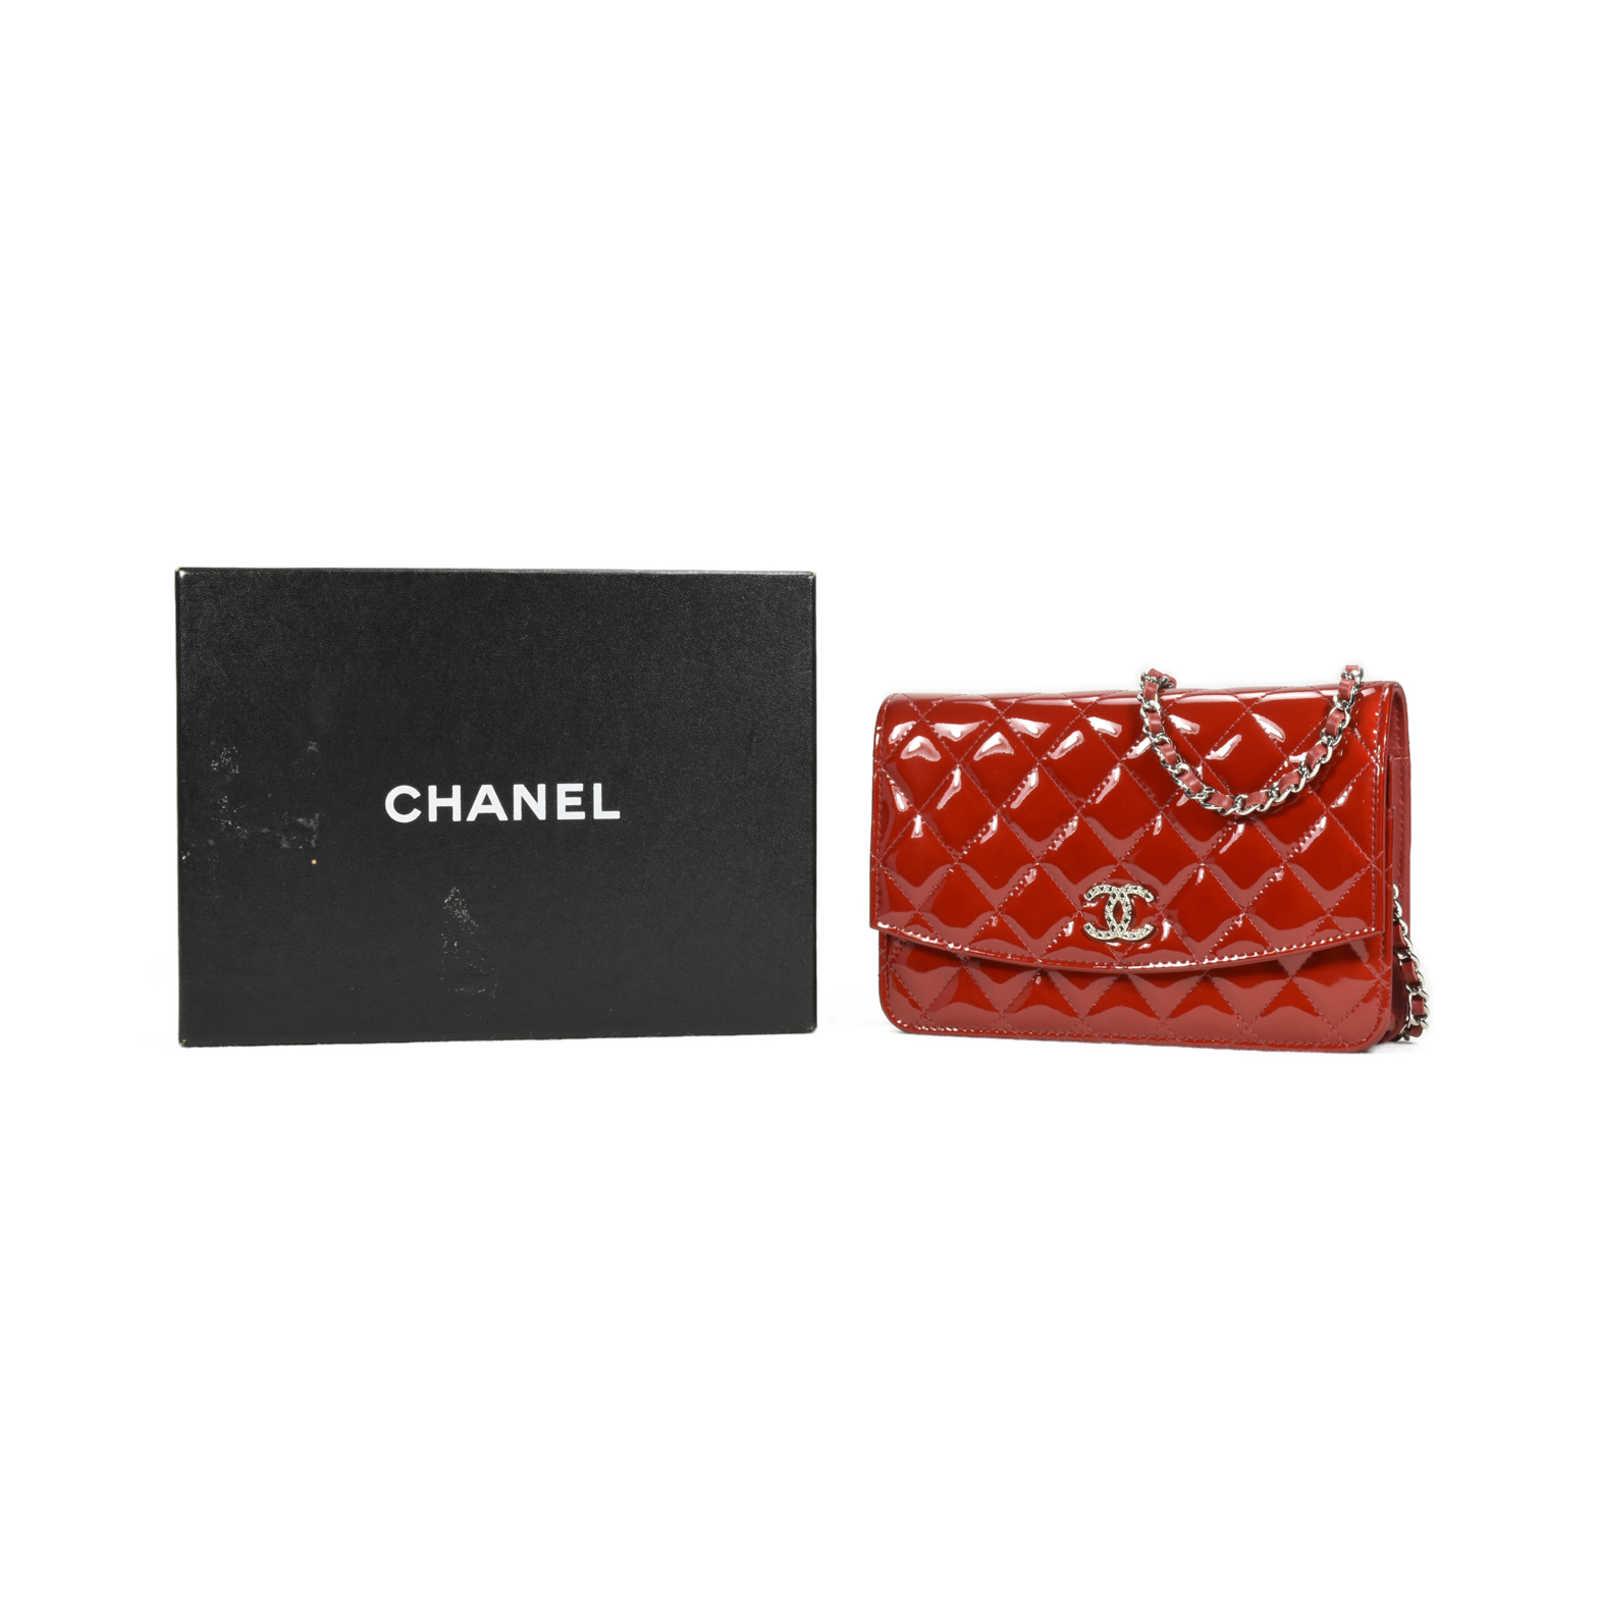 15e72b8de52d ... Authentic Second Hand Chanel Patent Brilliant Wallet on Chain  (PSS-240-00171)